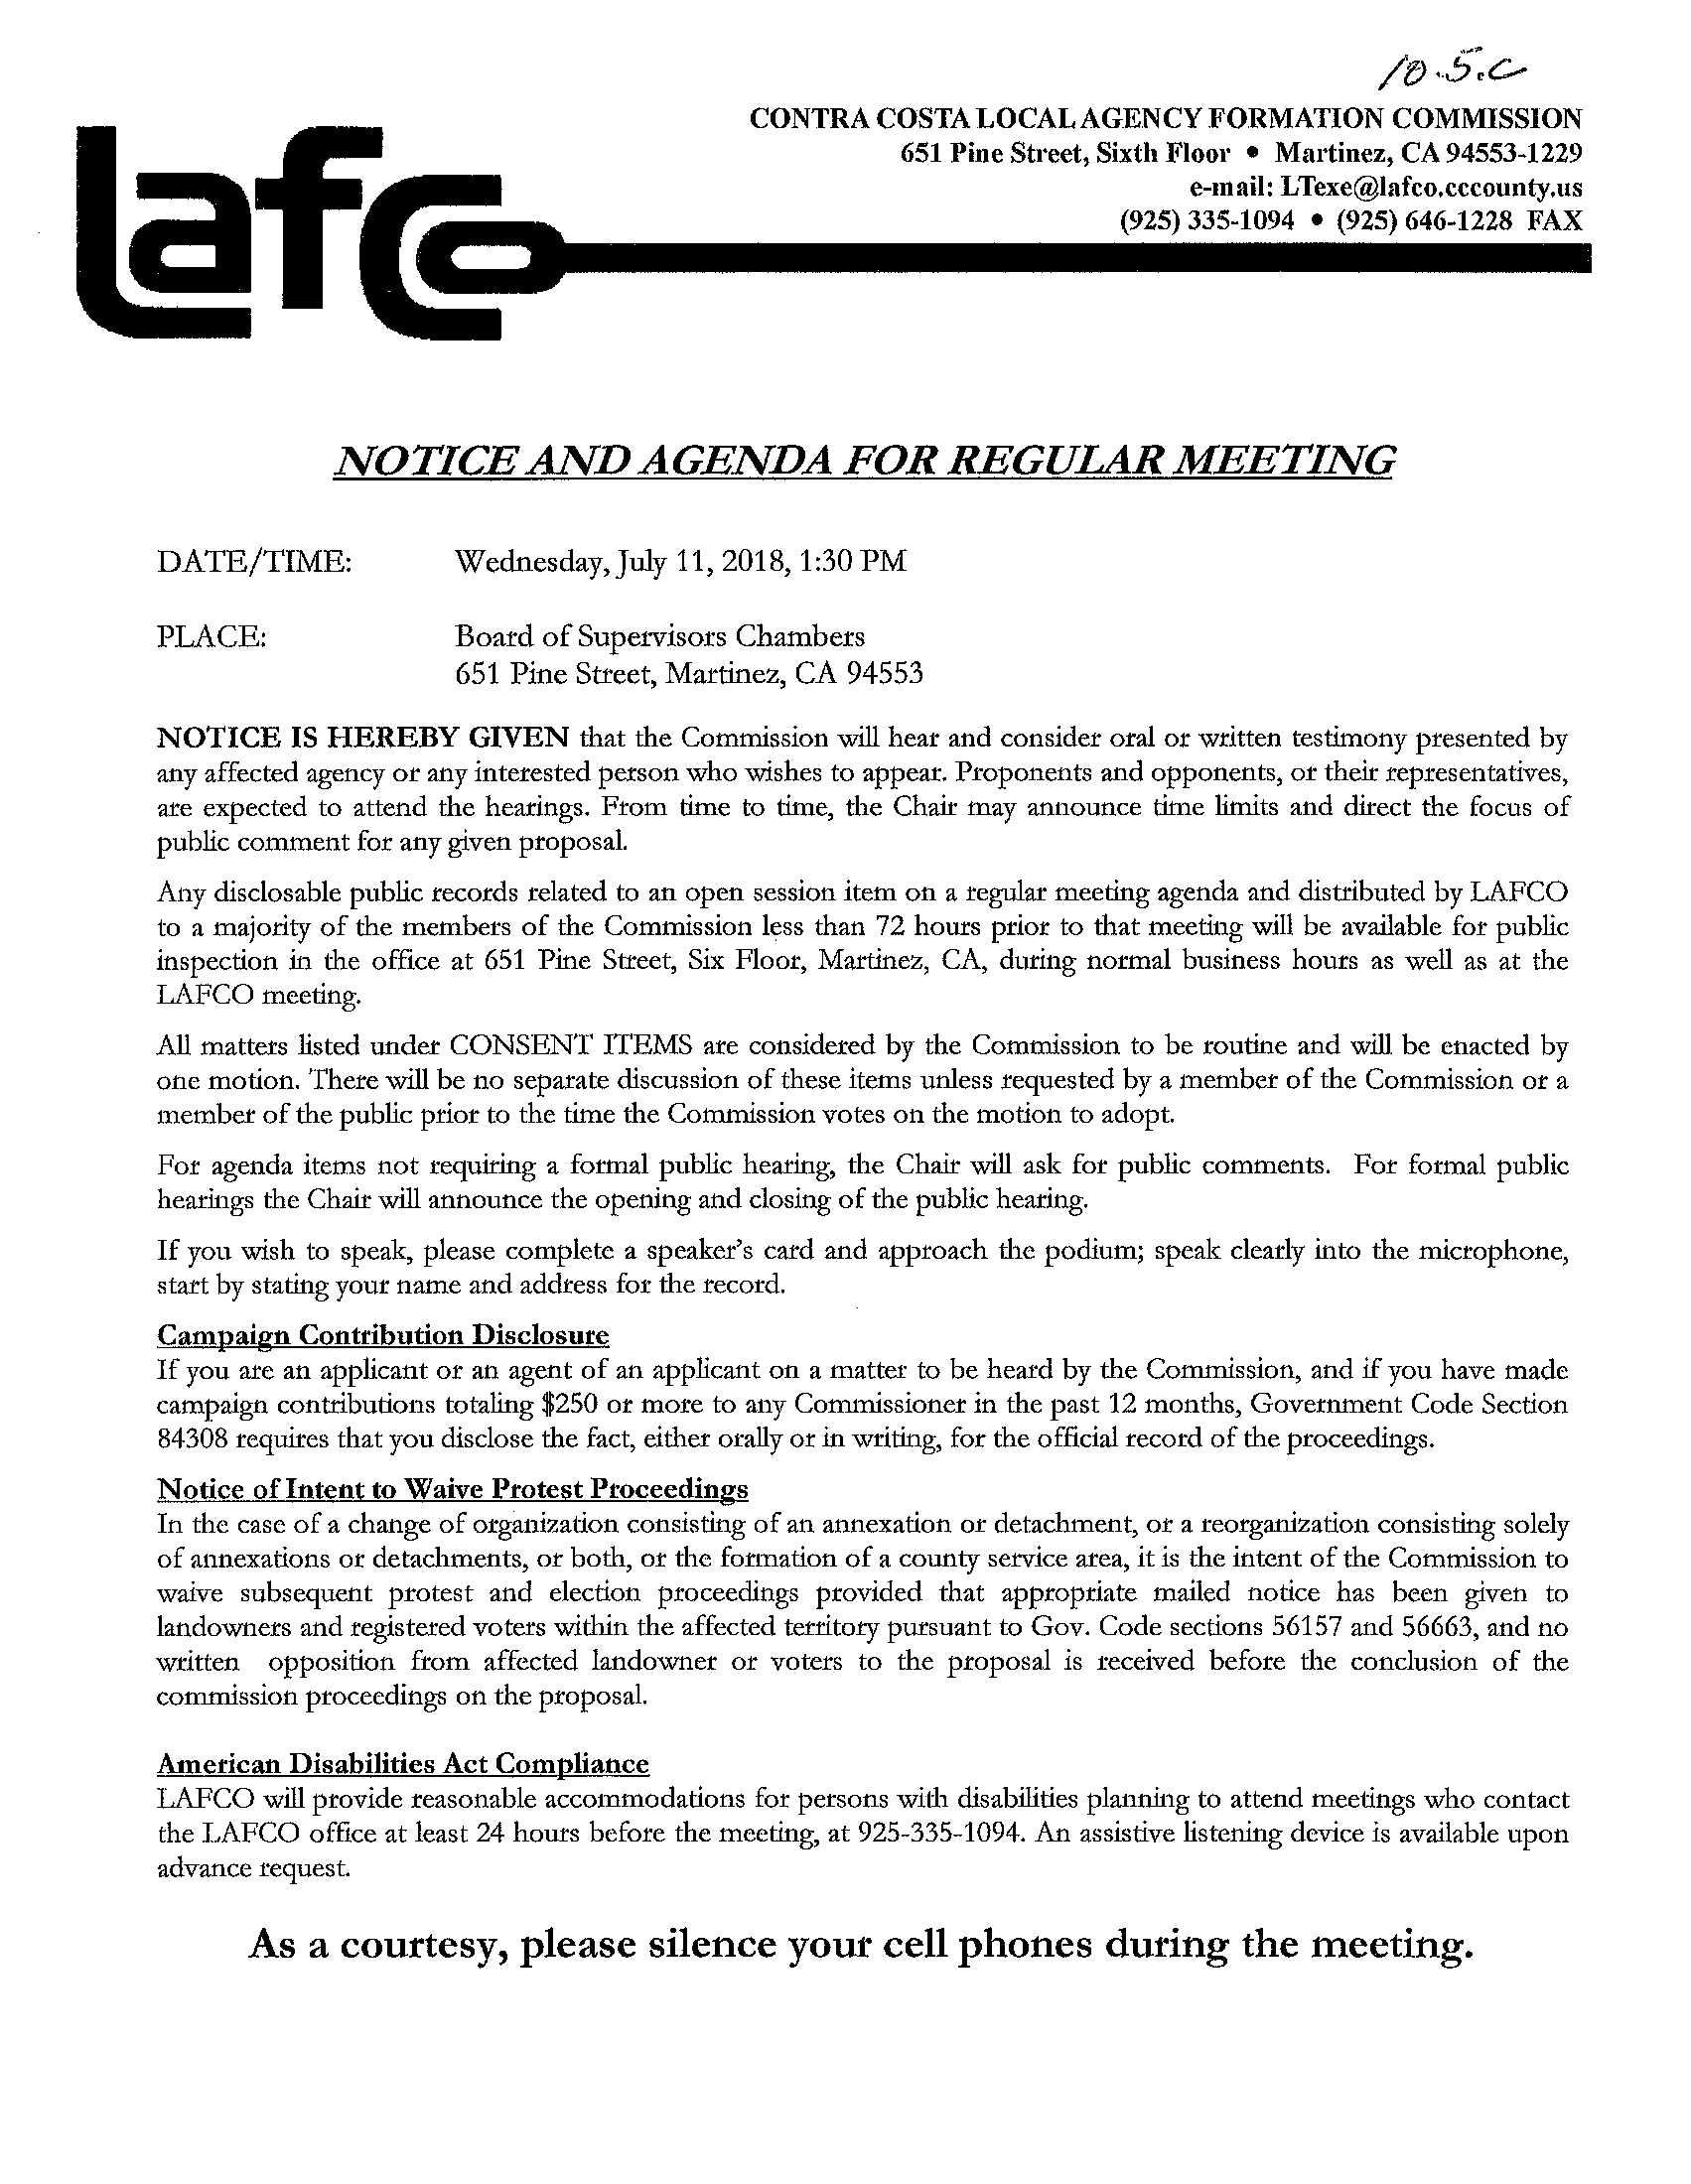 ESMAC Agenda 7.11.2018 (36 Pages)_35.jpg